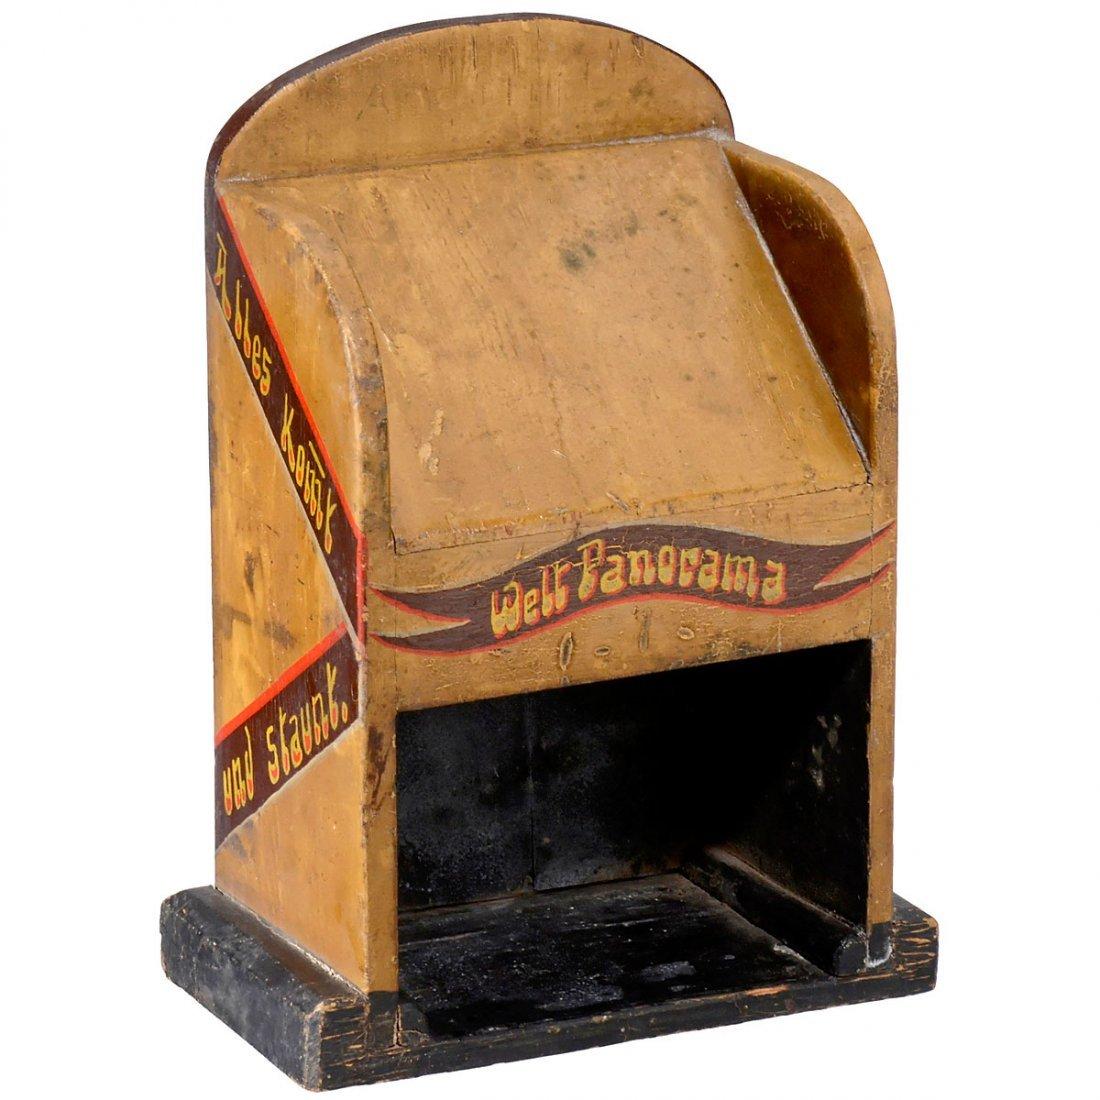 German Peep-Show Box, c. 1930 - 2